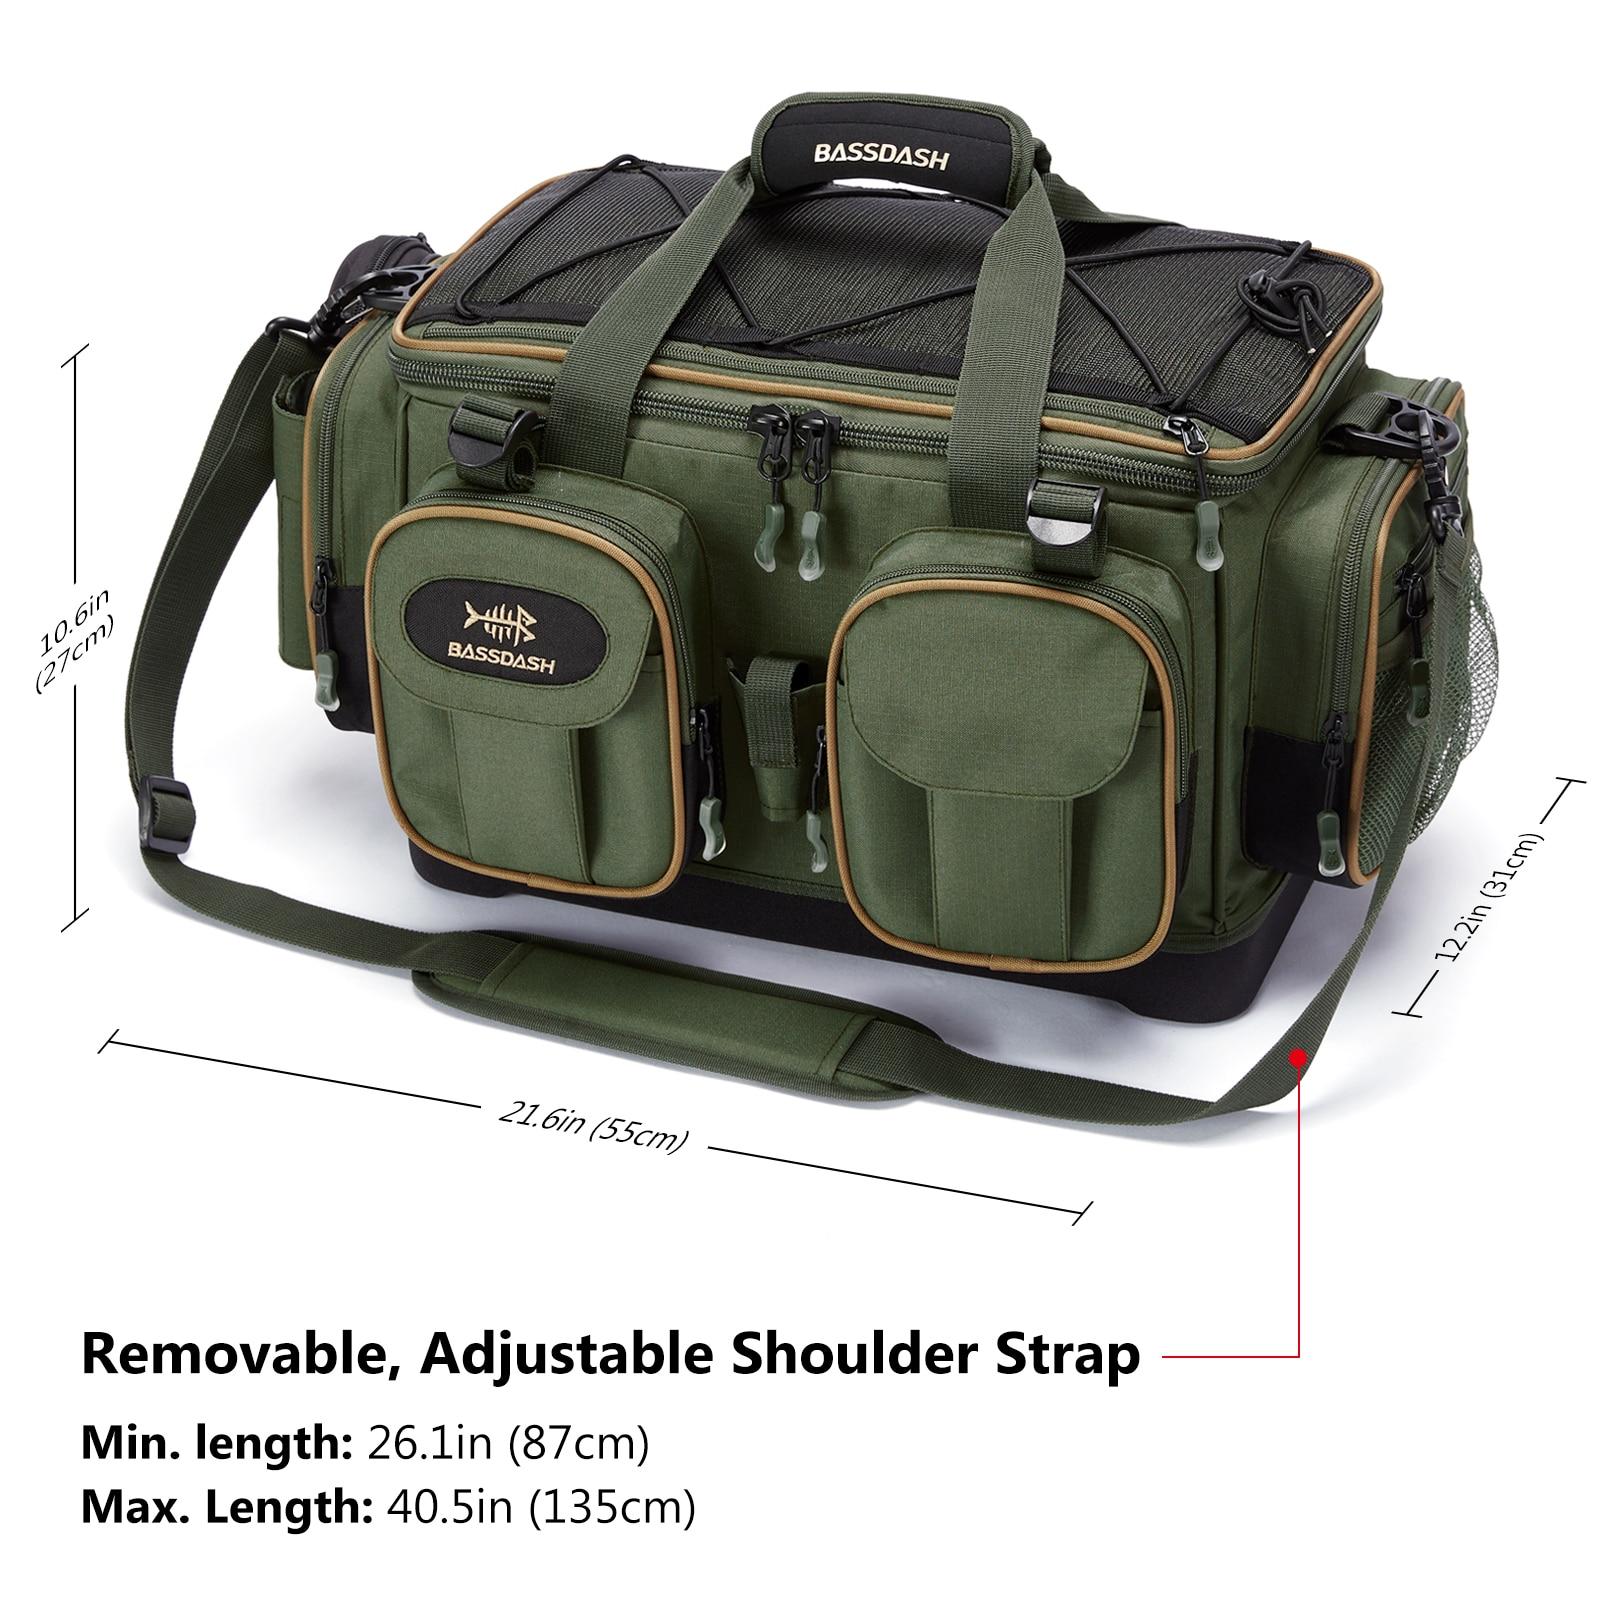 Fishing Tackle Shoulder Bag Water Resistant Lightweight Gear Storage Pack with Hard Molded Bottom Rain Cover enlarge